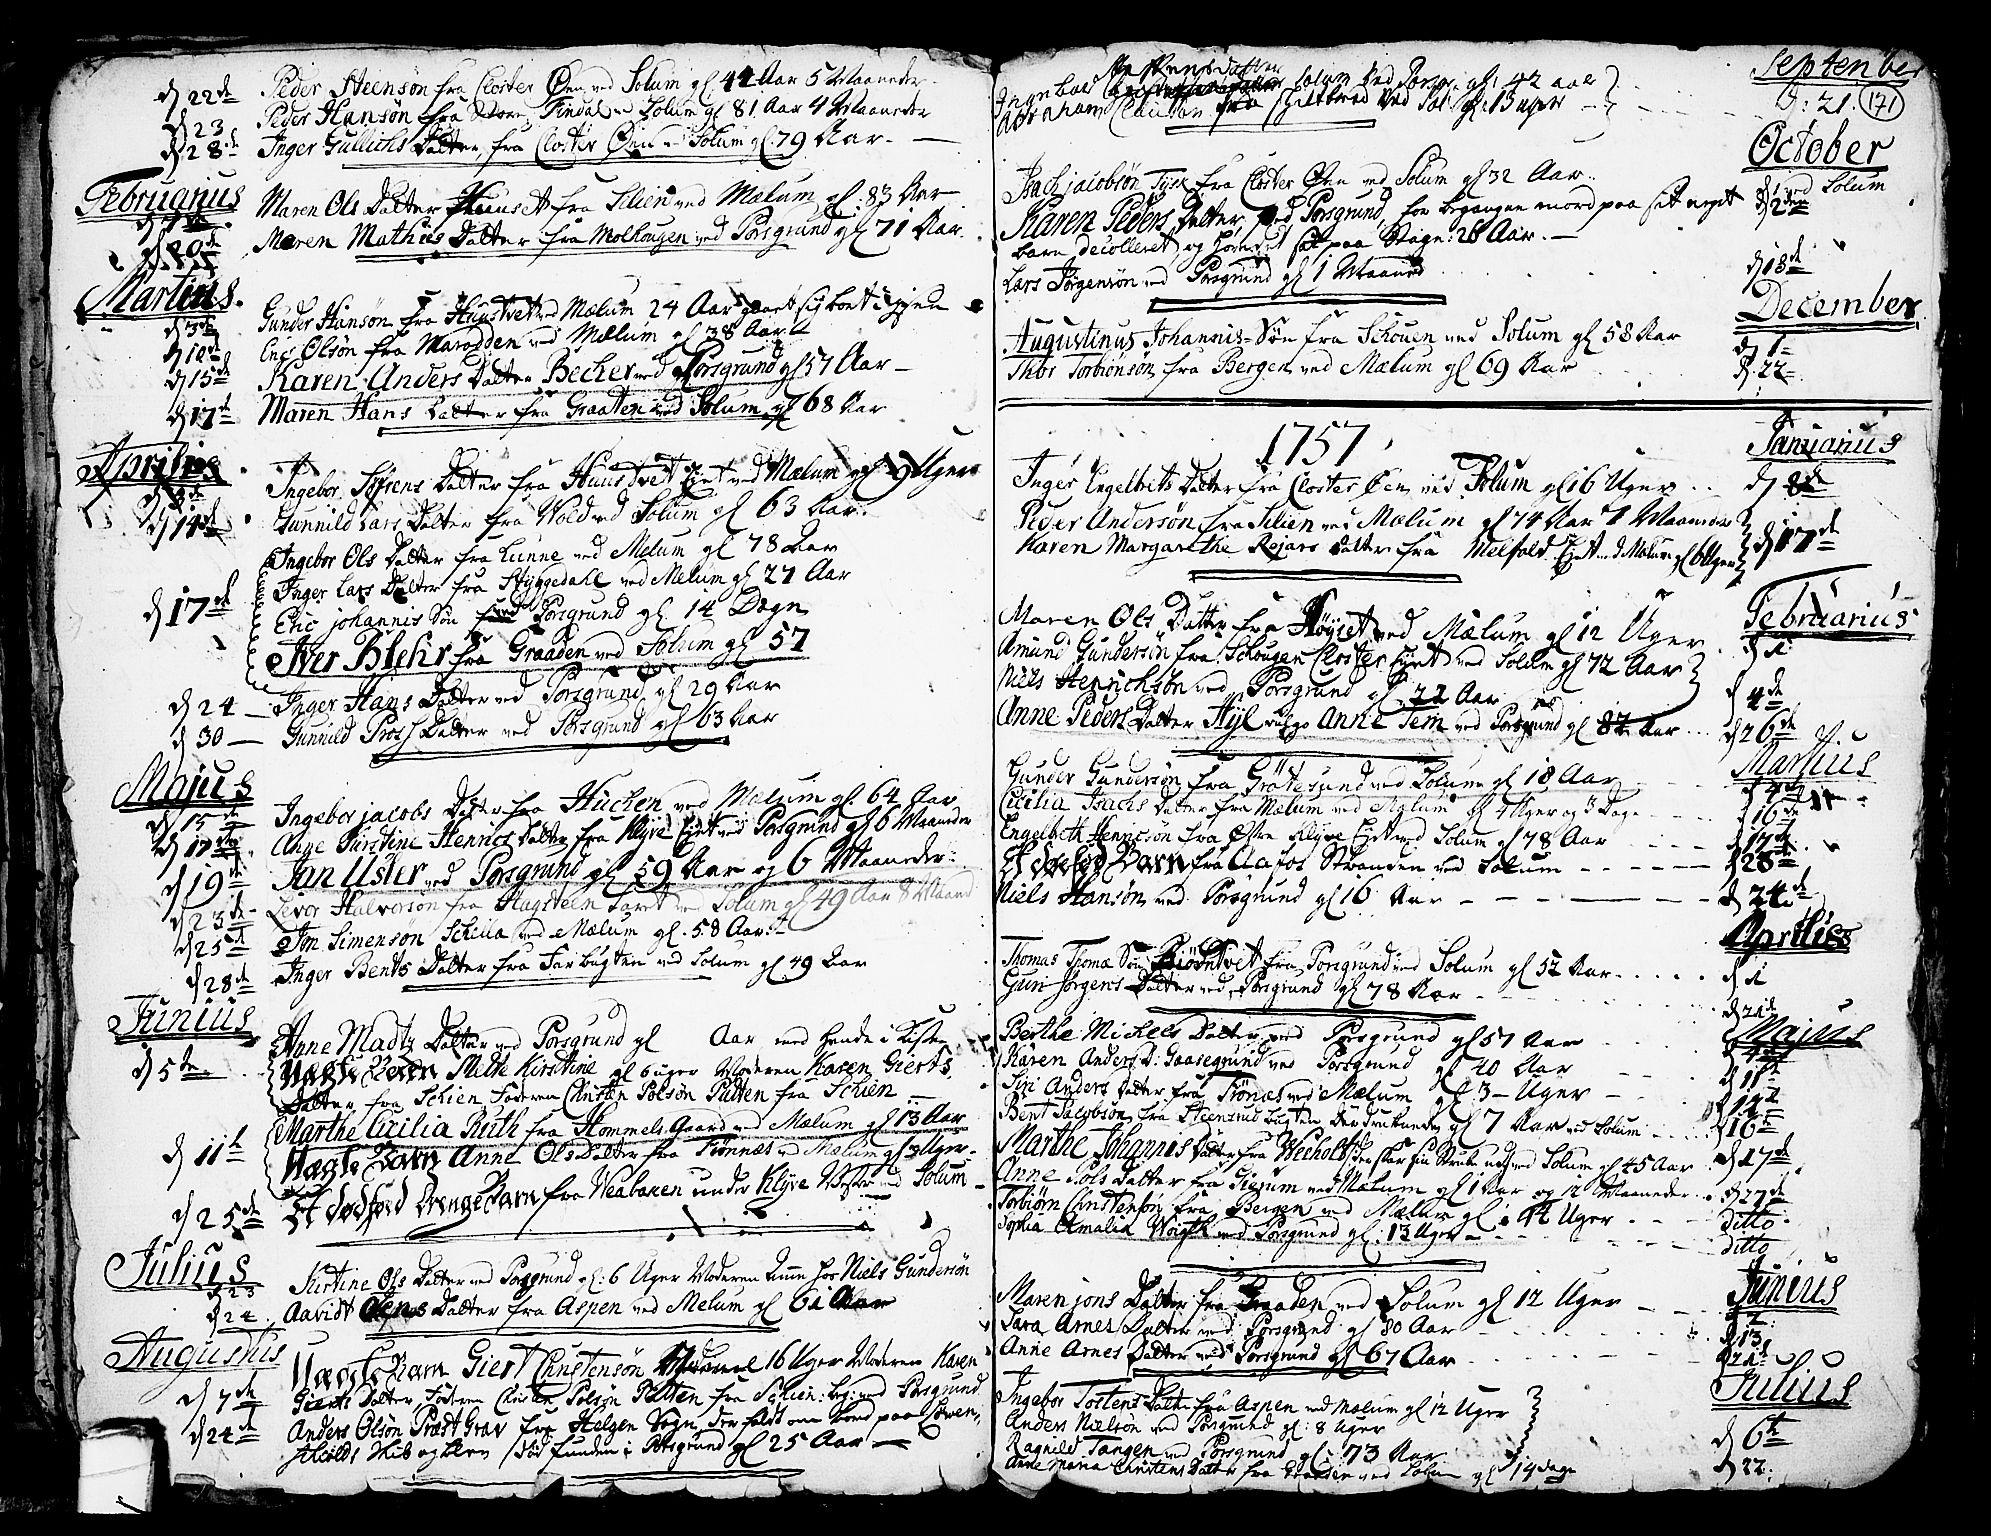 SAKO, Solum kirkebøker, F/Fa/L0002: Ministerialbok nr. I 2, 1713-1761, s. 171